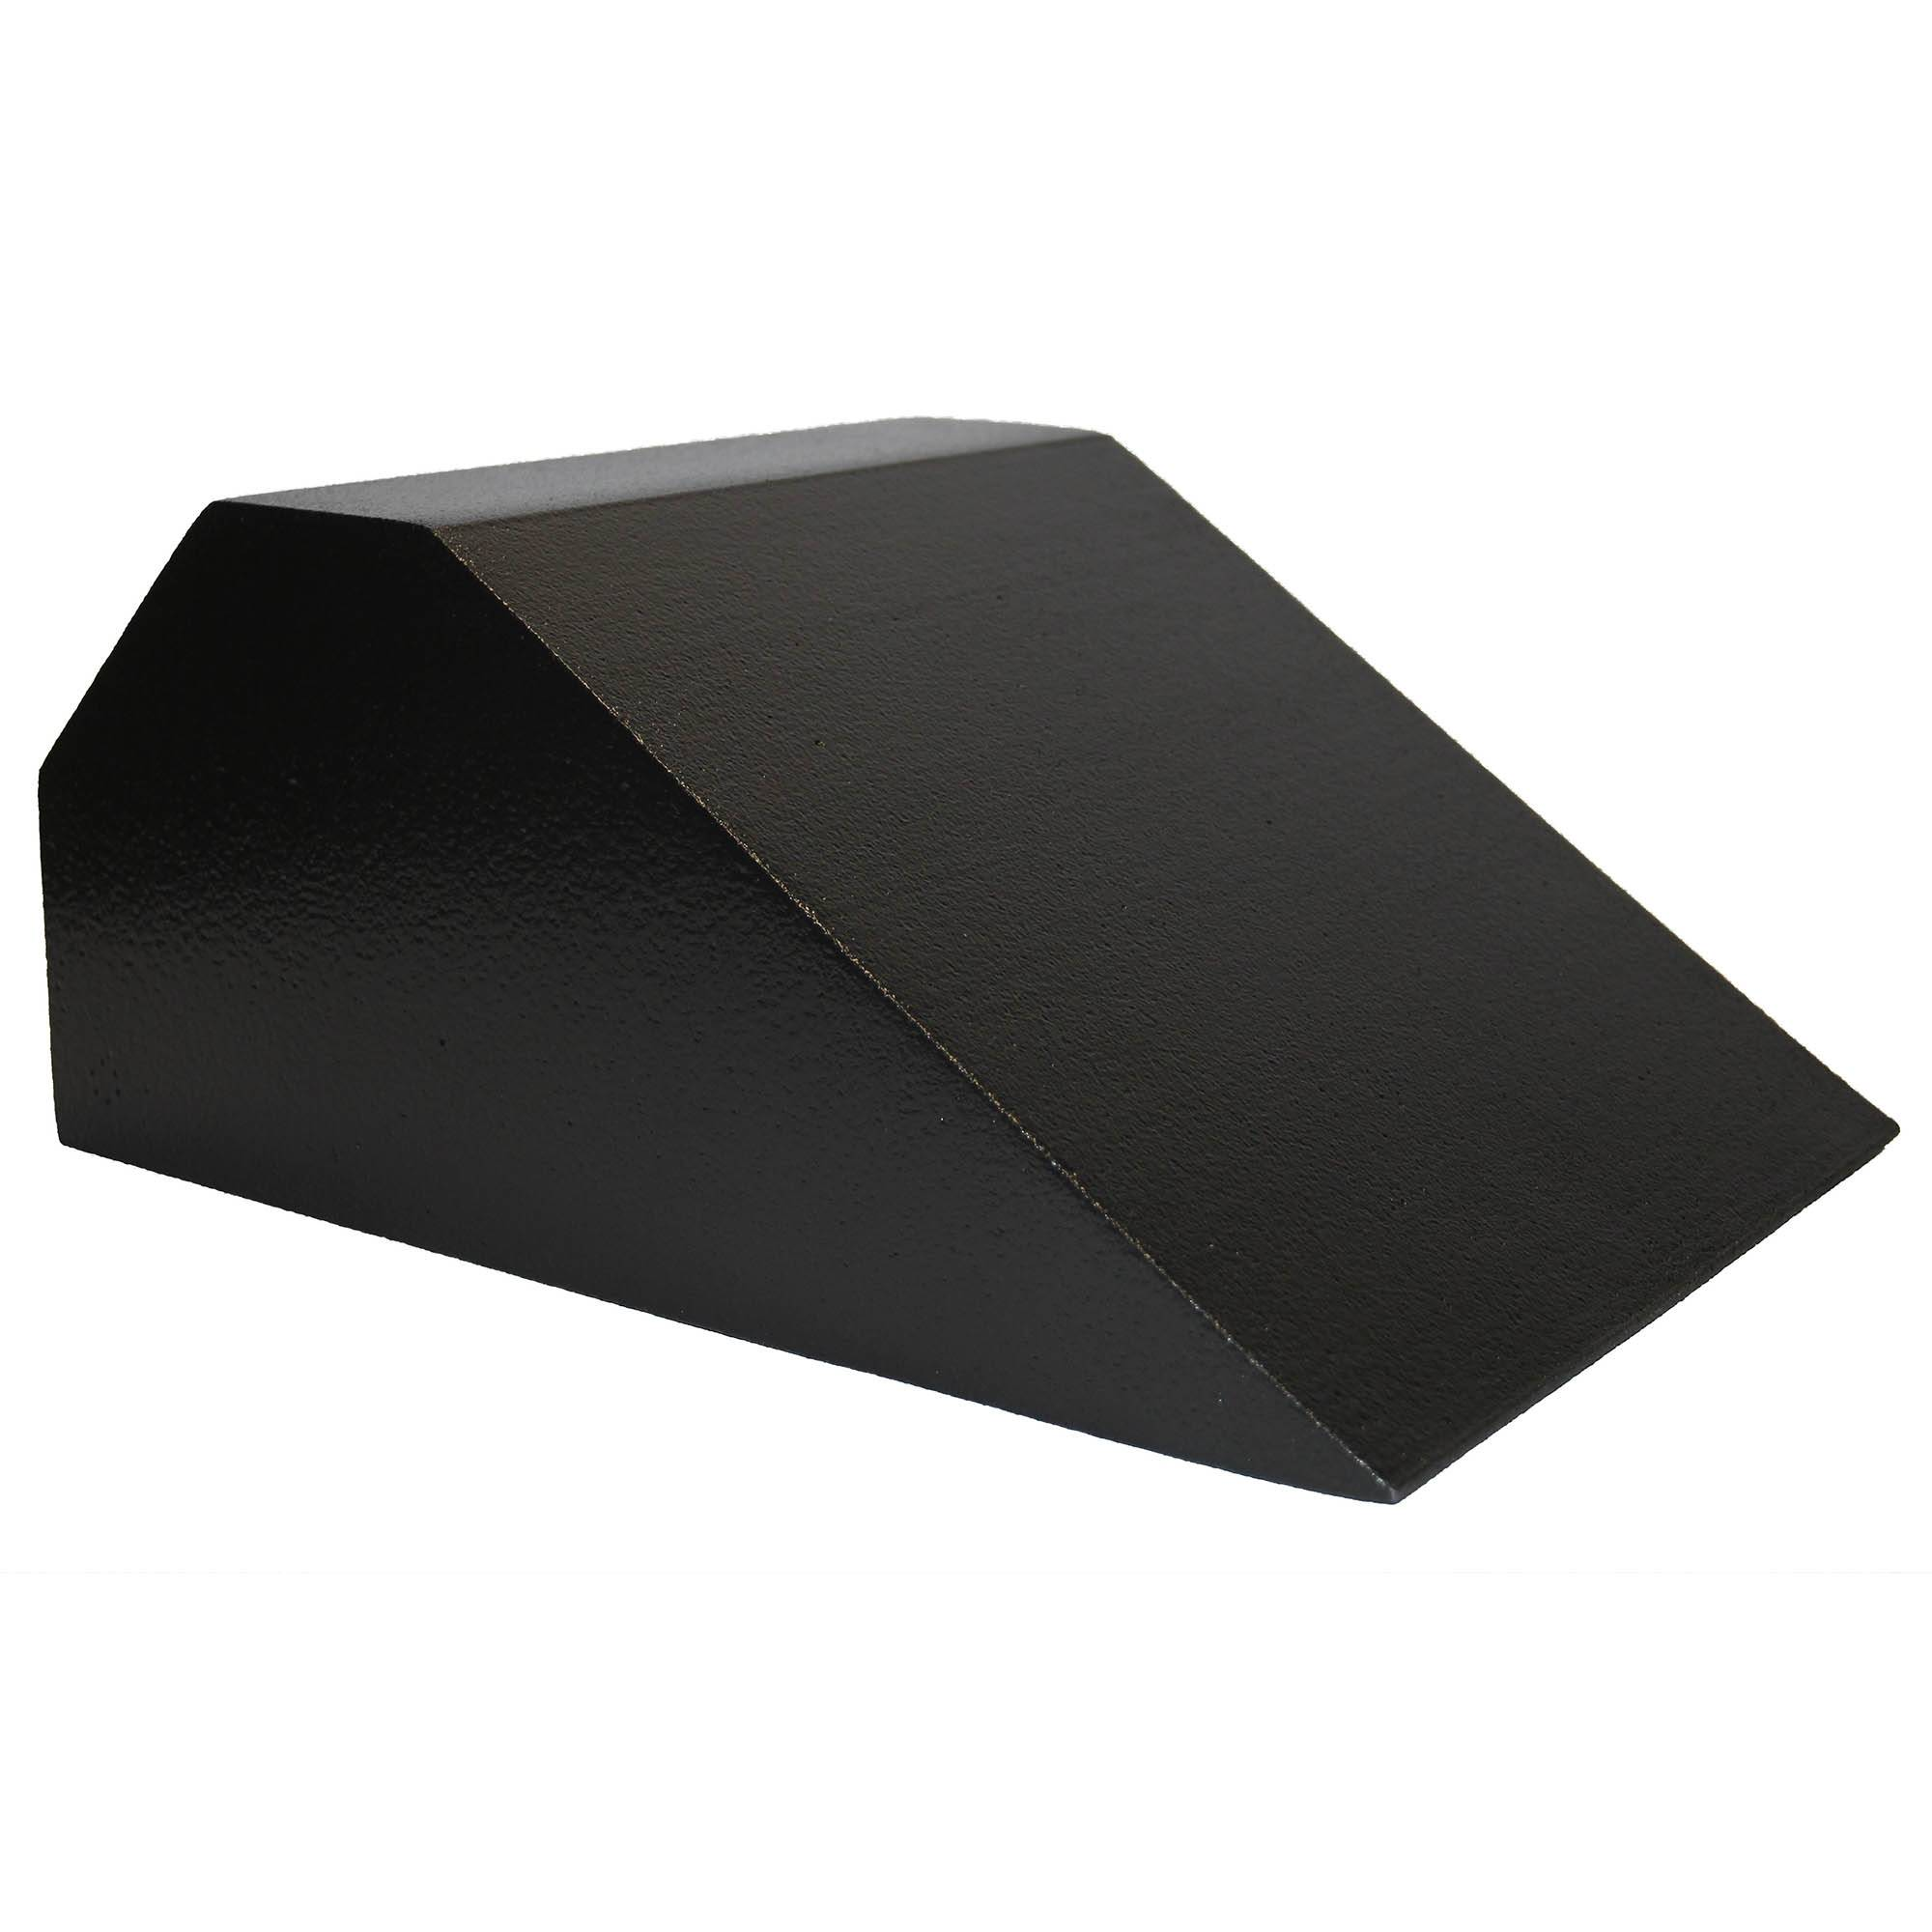 Torso Block 27 Degree - ScanCoat Black - 7